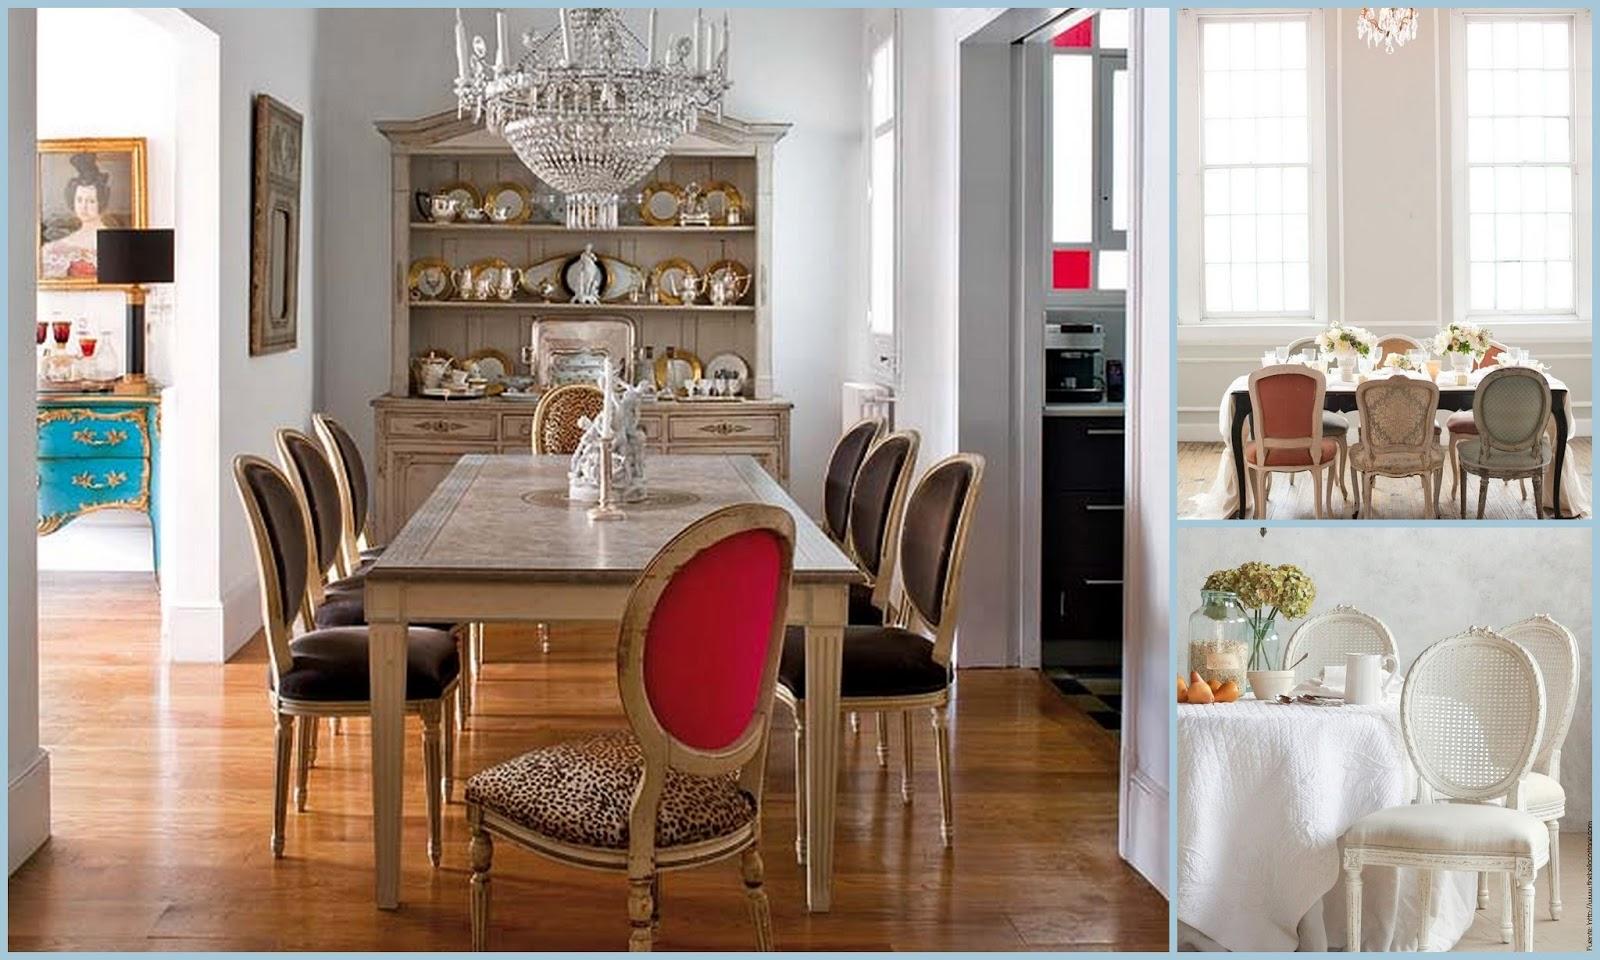 Dolce hogar silla estilo luis xvi for Estilo hogar muebles